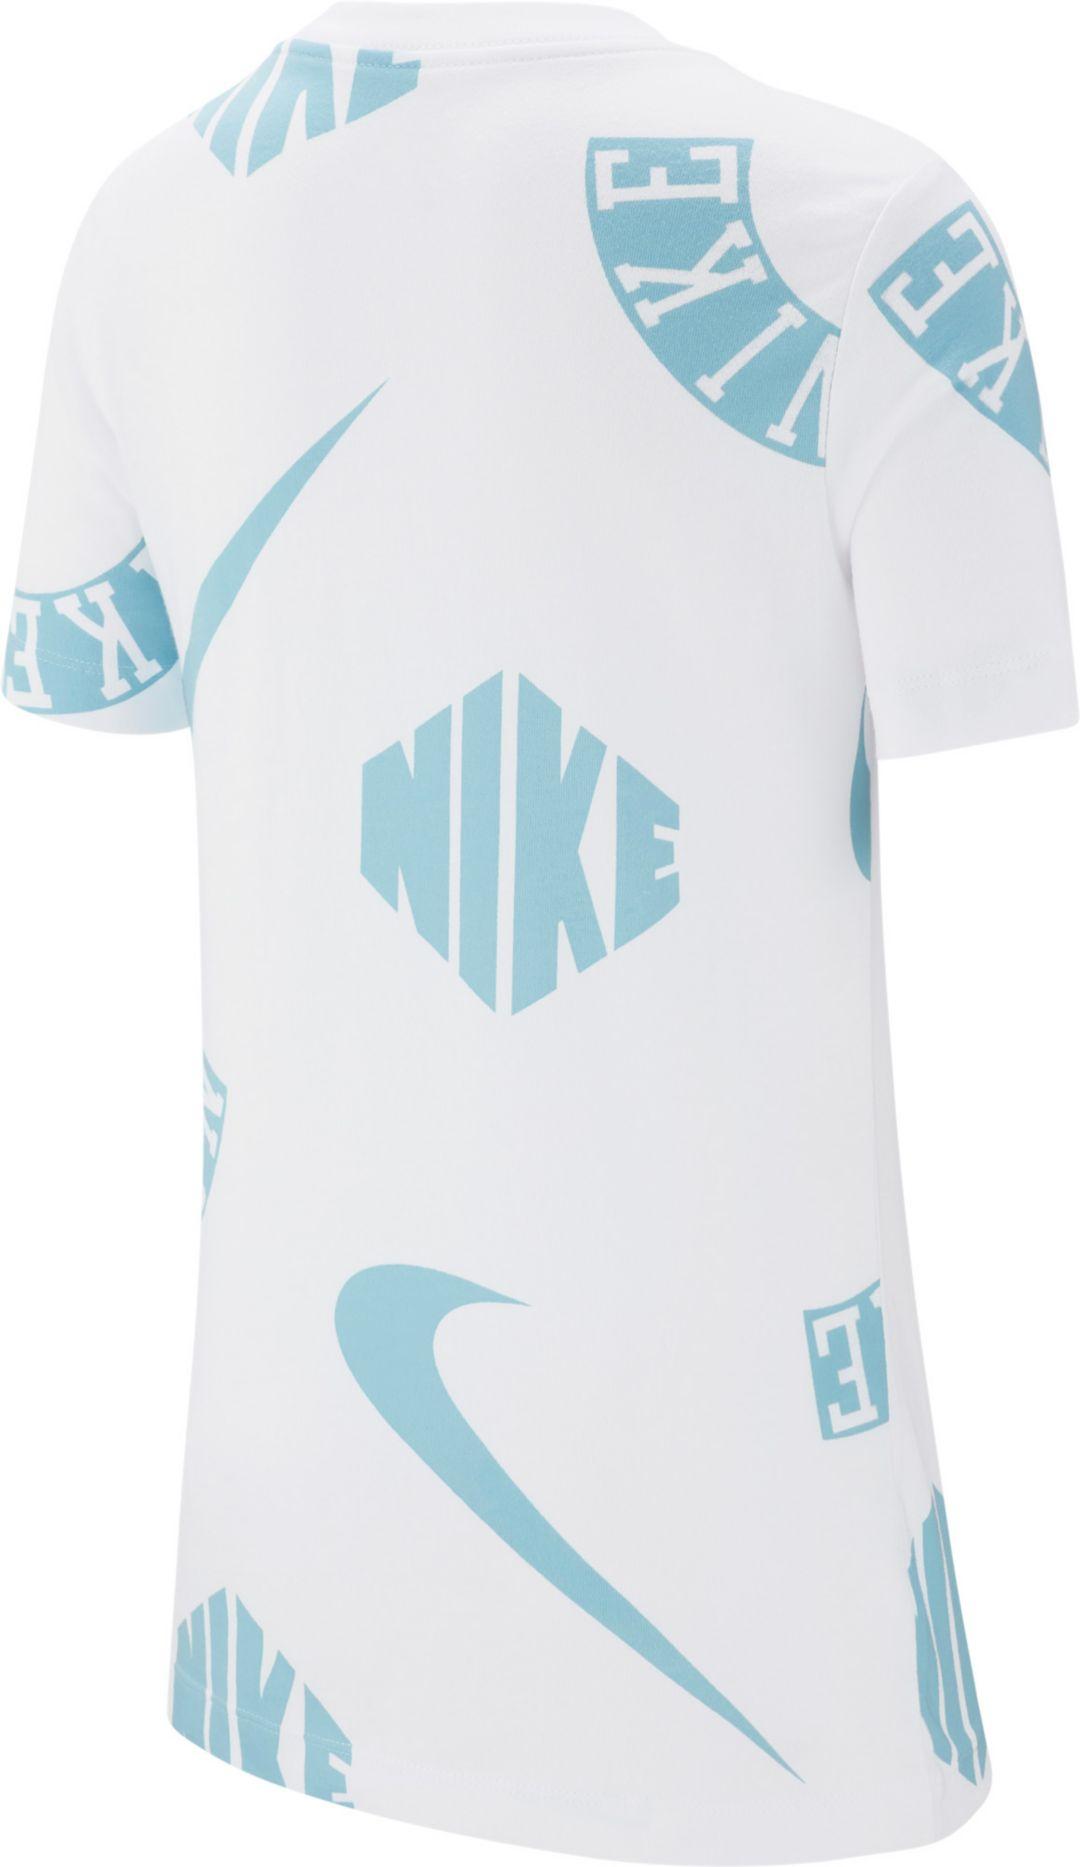 ec91cccb8c Nike Boys' Sportswear Allover Print Collage Graphic Tee | DICK'S ...